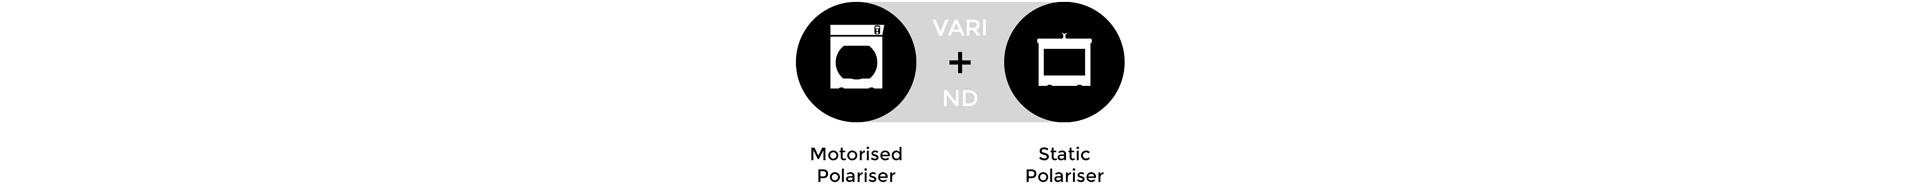 Cinefade Application icon VariND